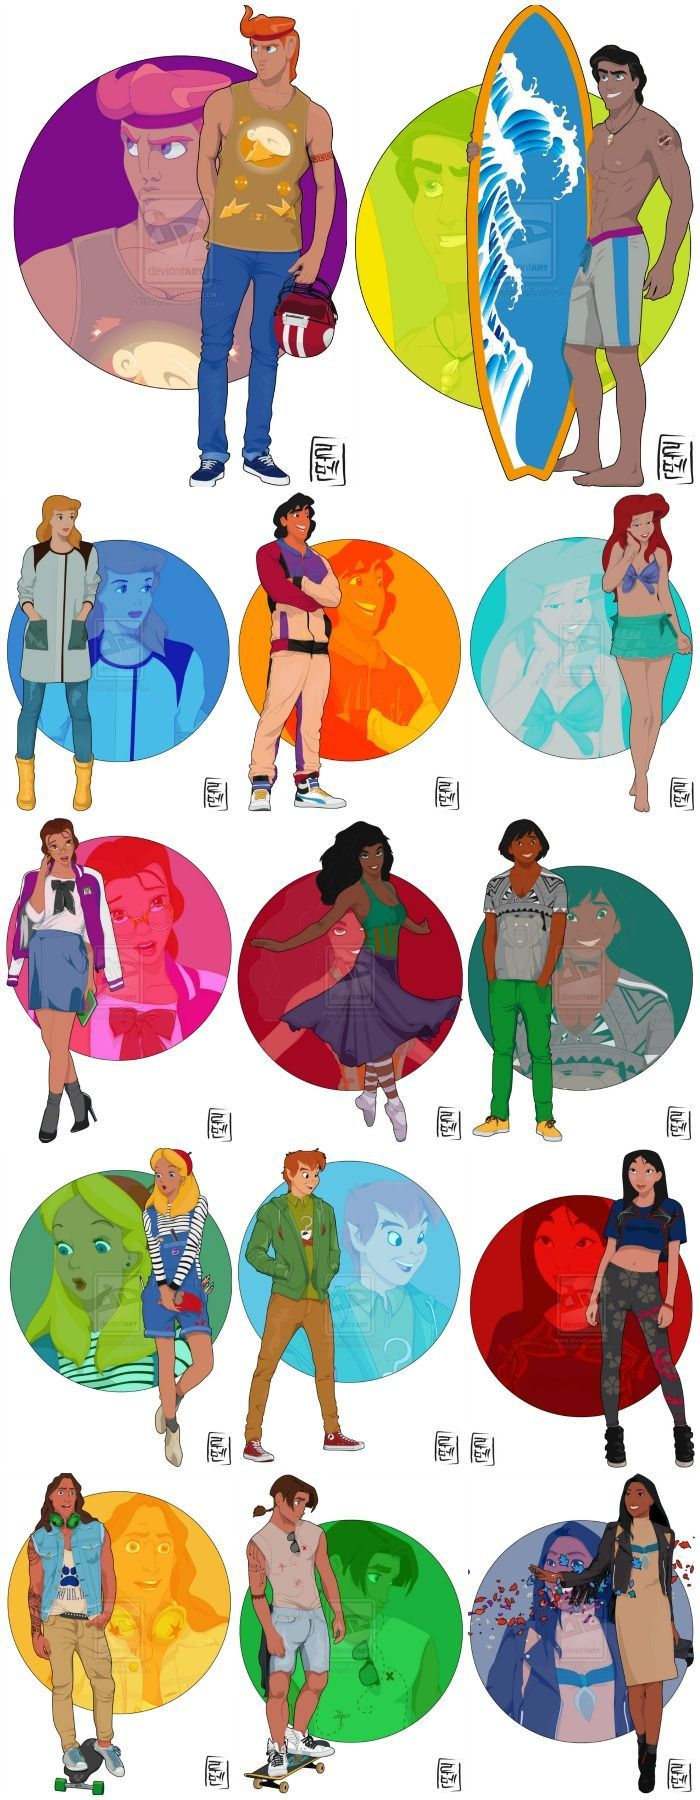 Community Post: High Fashion Disney Princesses